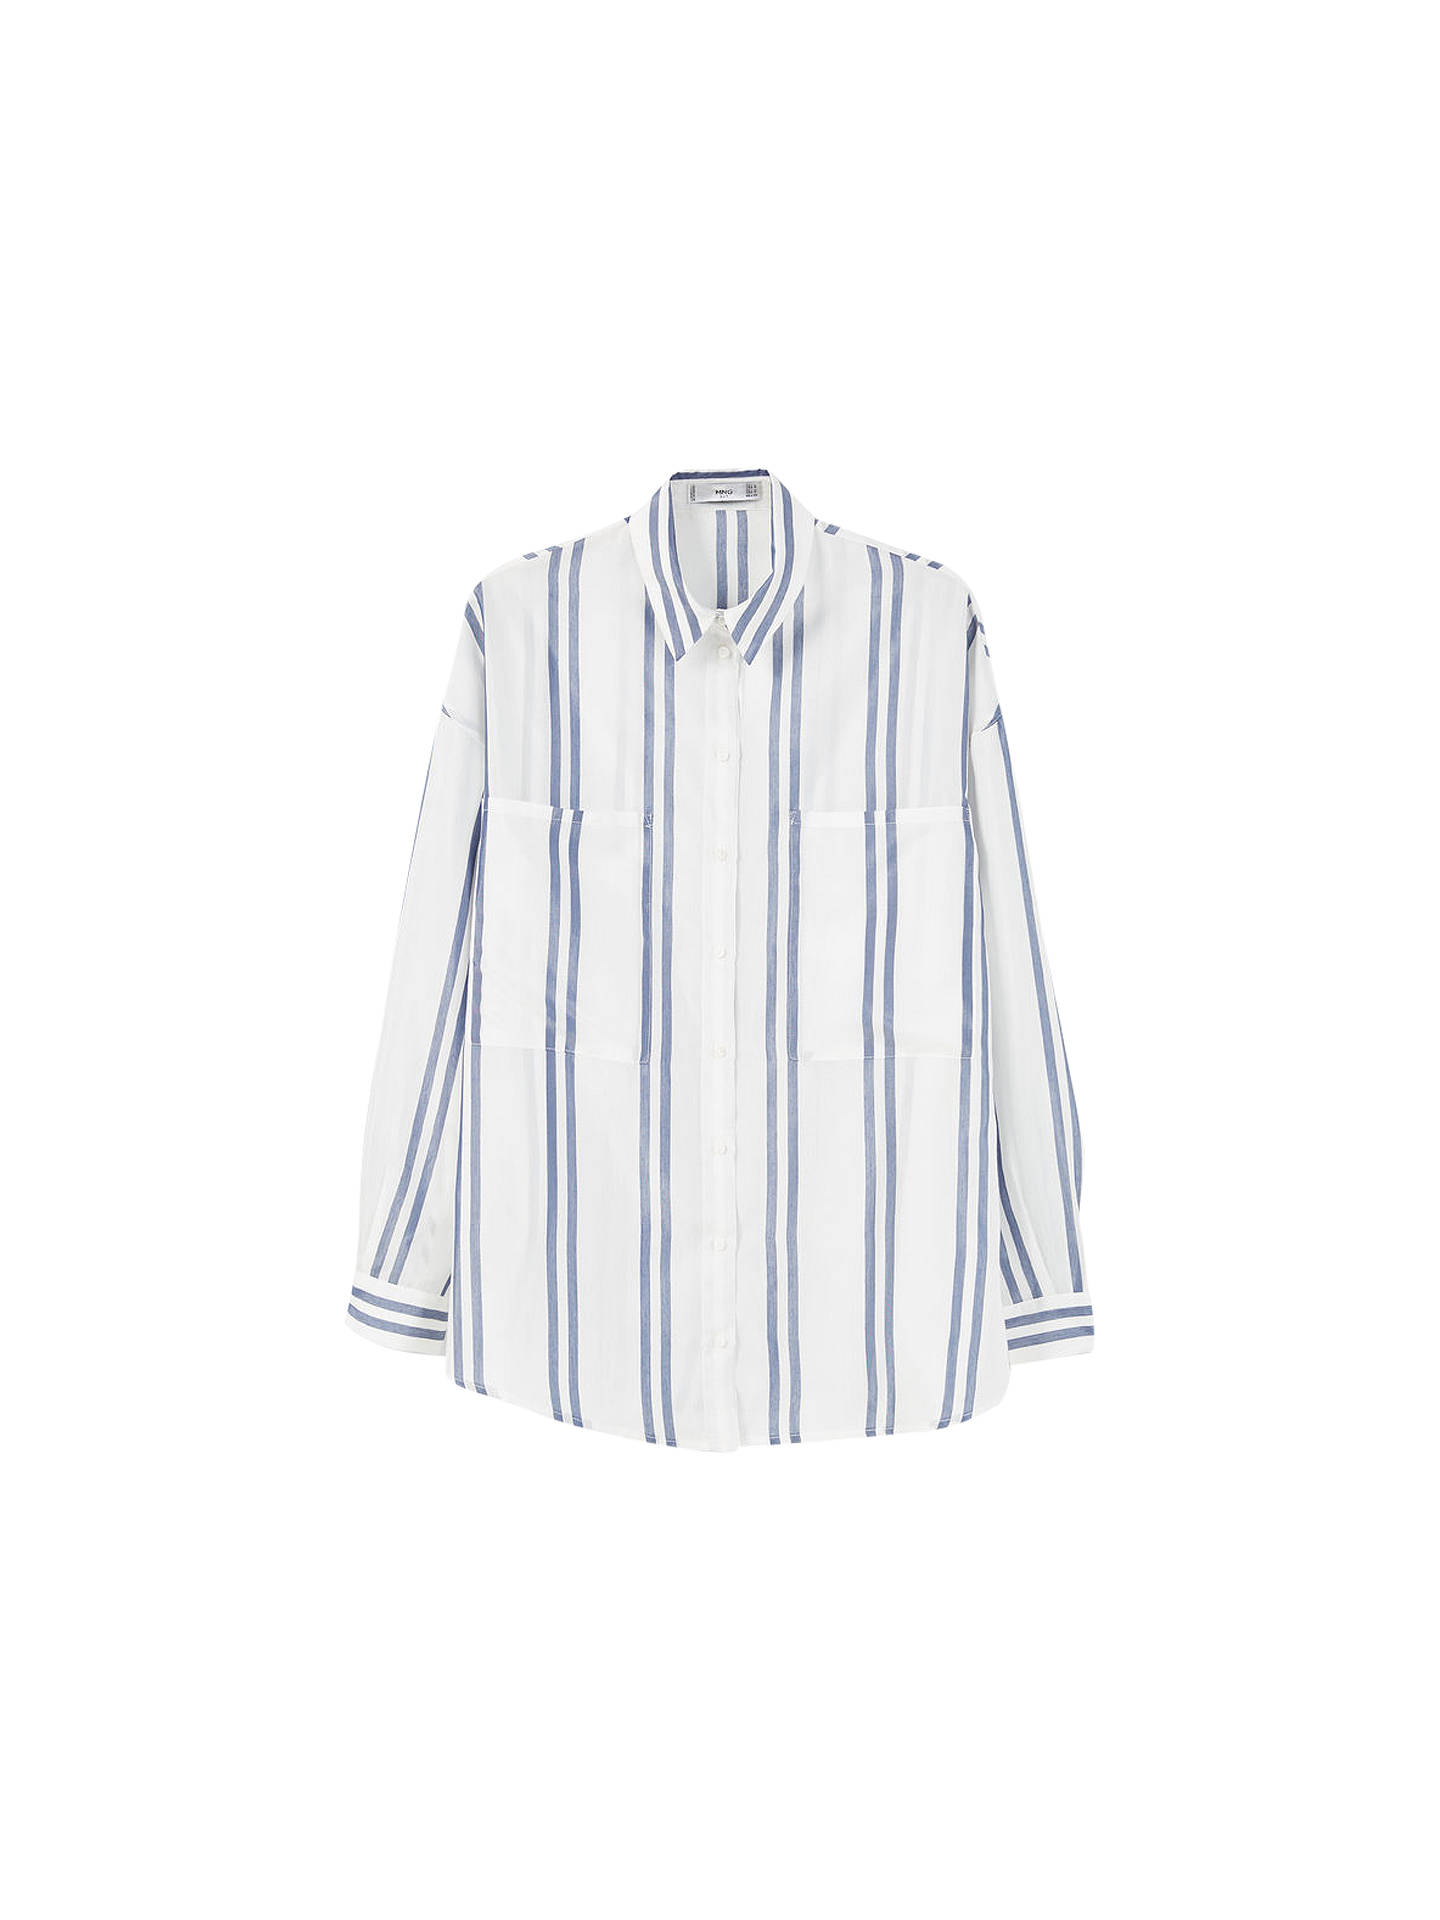 a968c0ef5b Buy Mango Oversized Striped Shirt, Navy/White, 6 Online at johnlewis.com ...